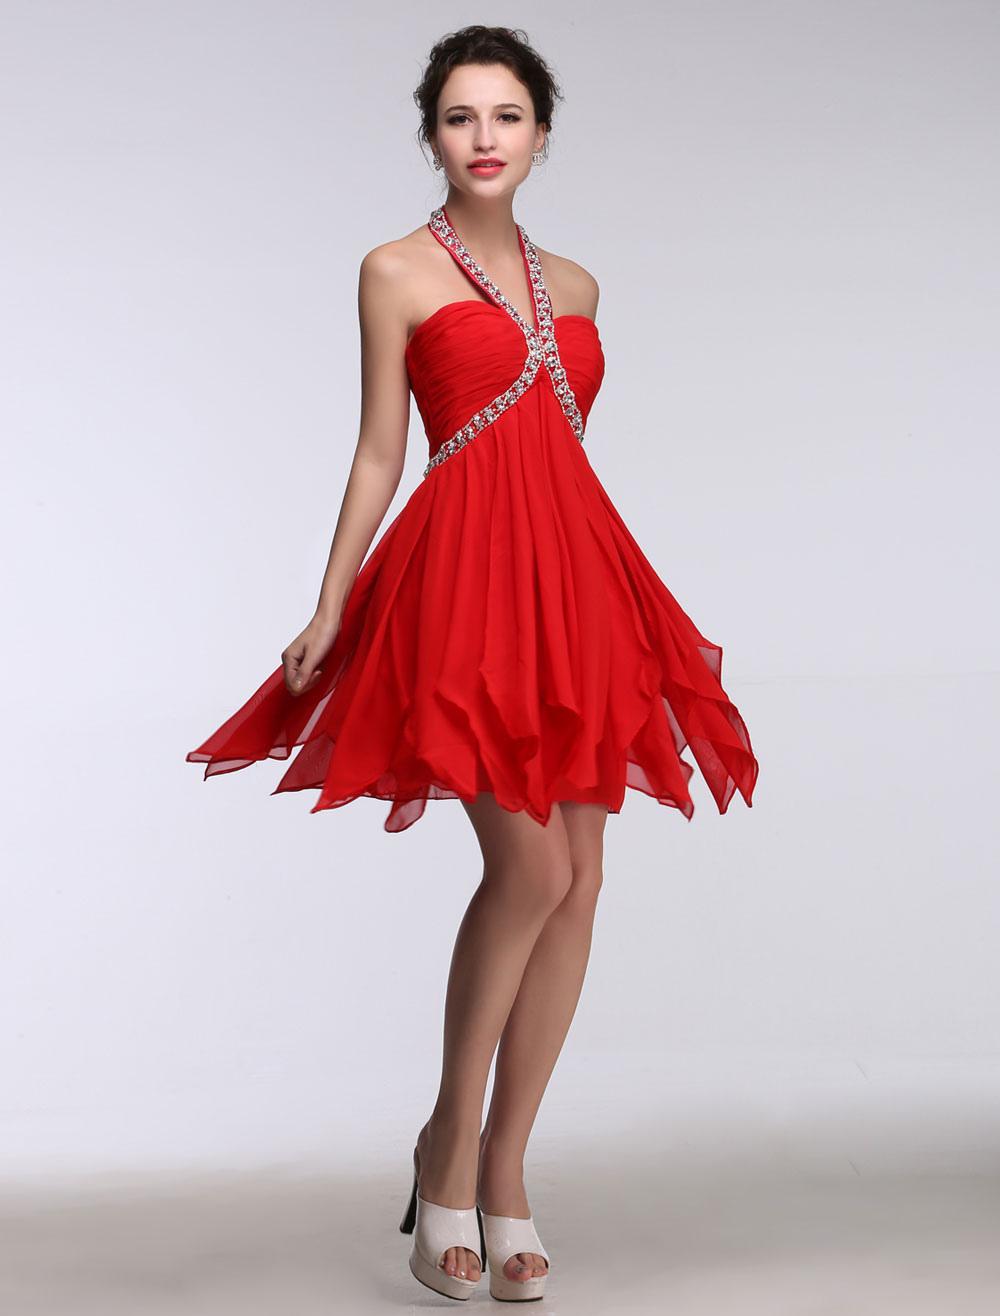 Red Homecoming Dresses Halter Backless Short Prom Dresses Beading Chiffon Mini Cocktail Dress (Wedding) photo